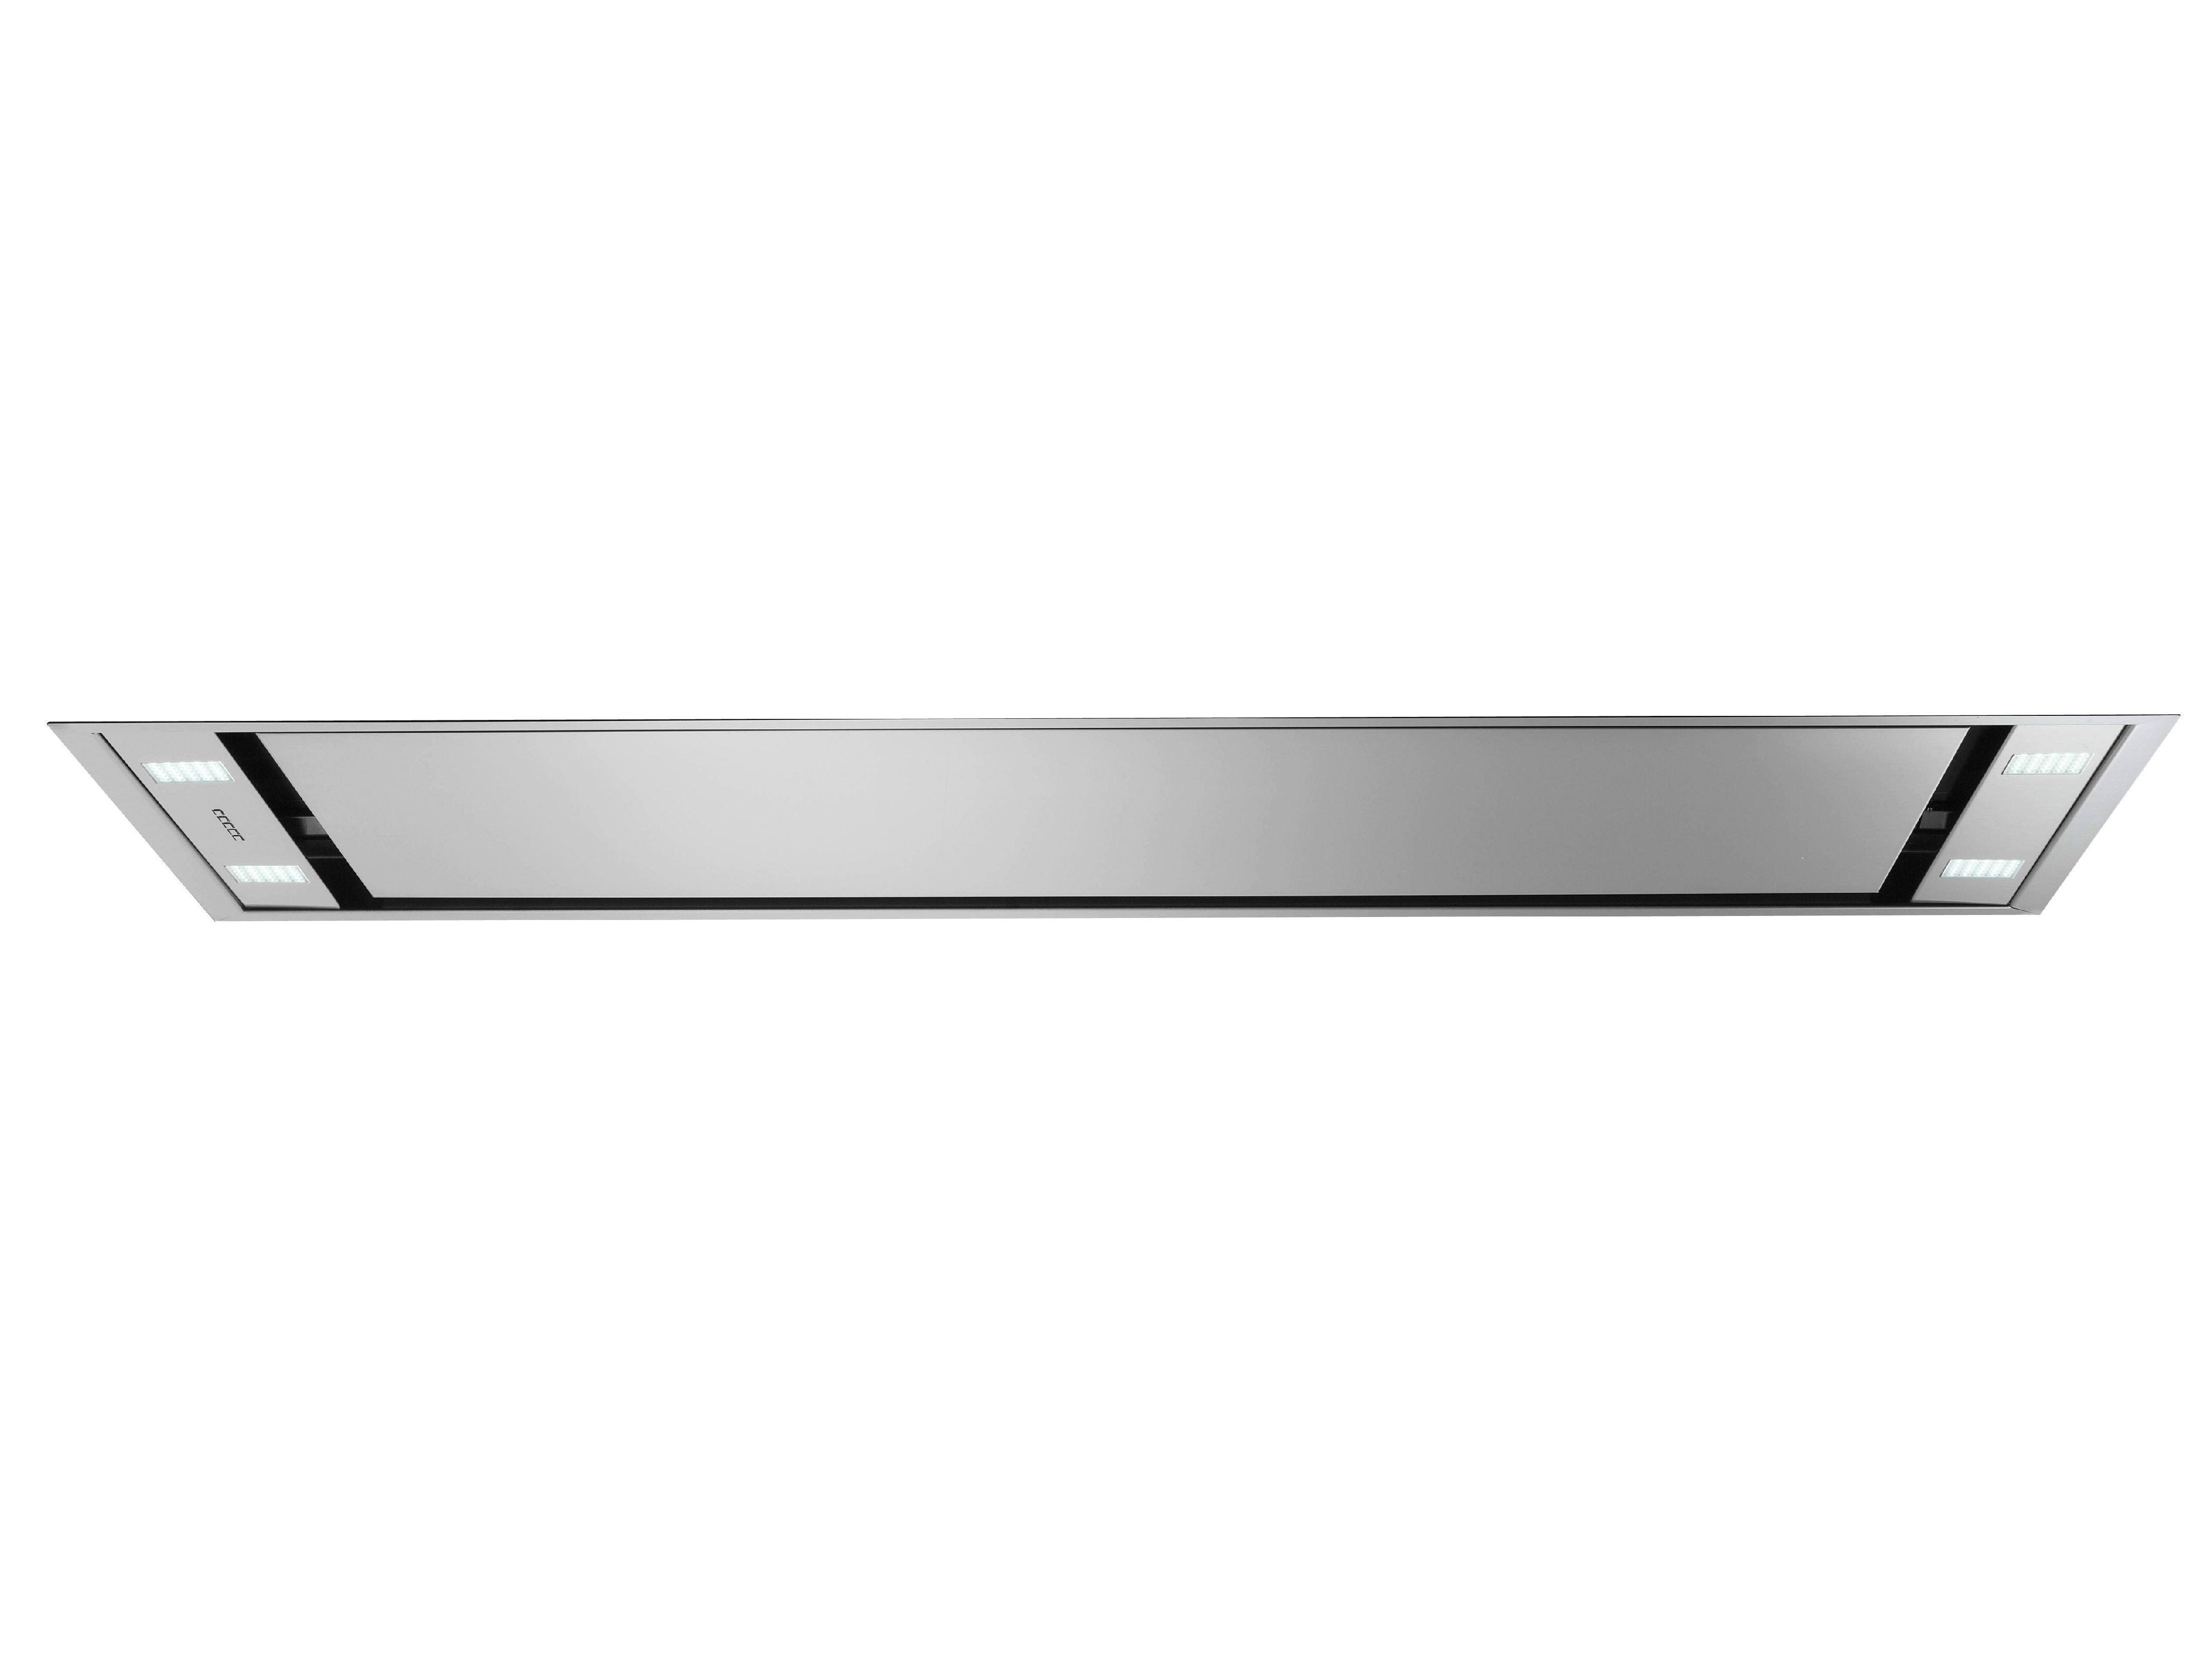 hotte de plafond falmec stella3430 electromenager grossiste